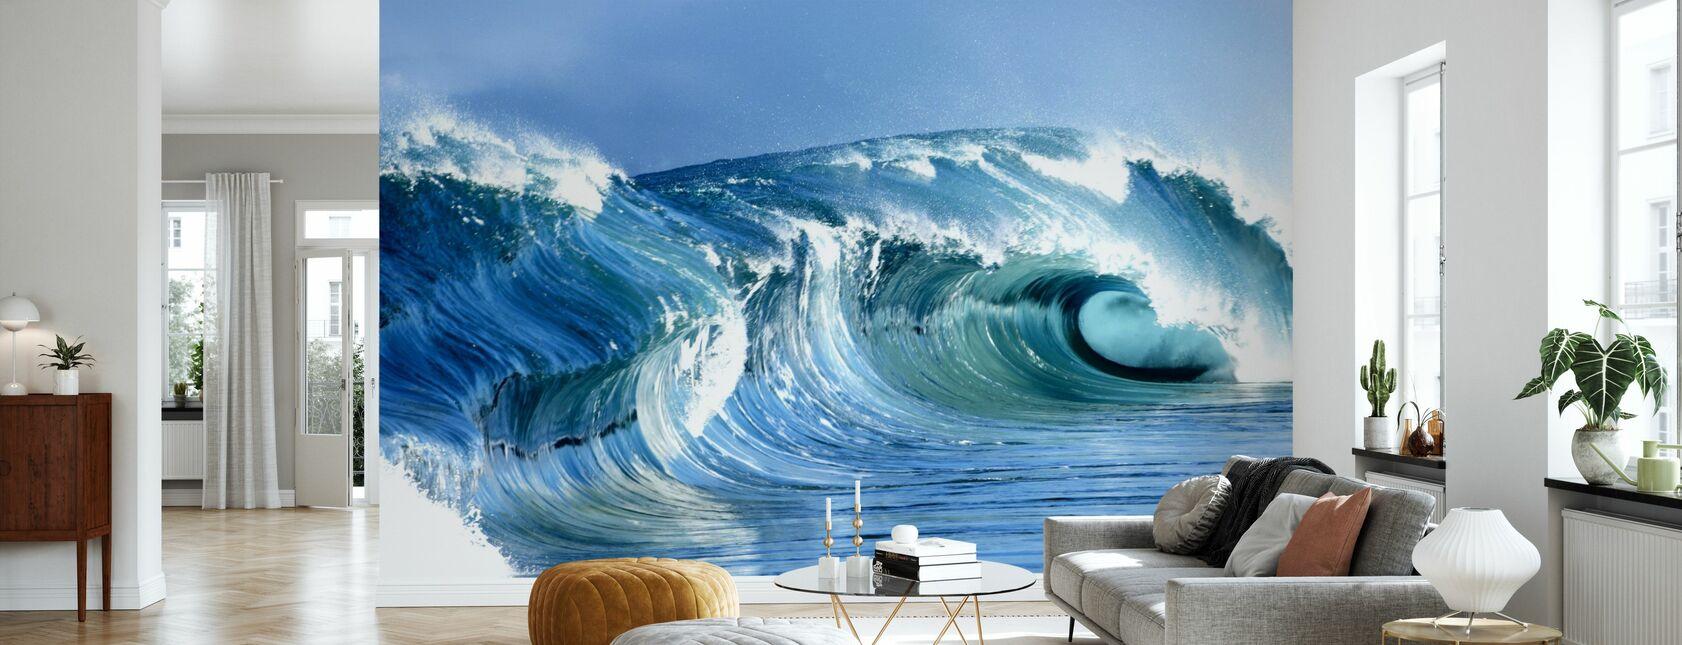 Jarvis Wave - Wallpaper - Living Room